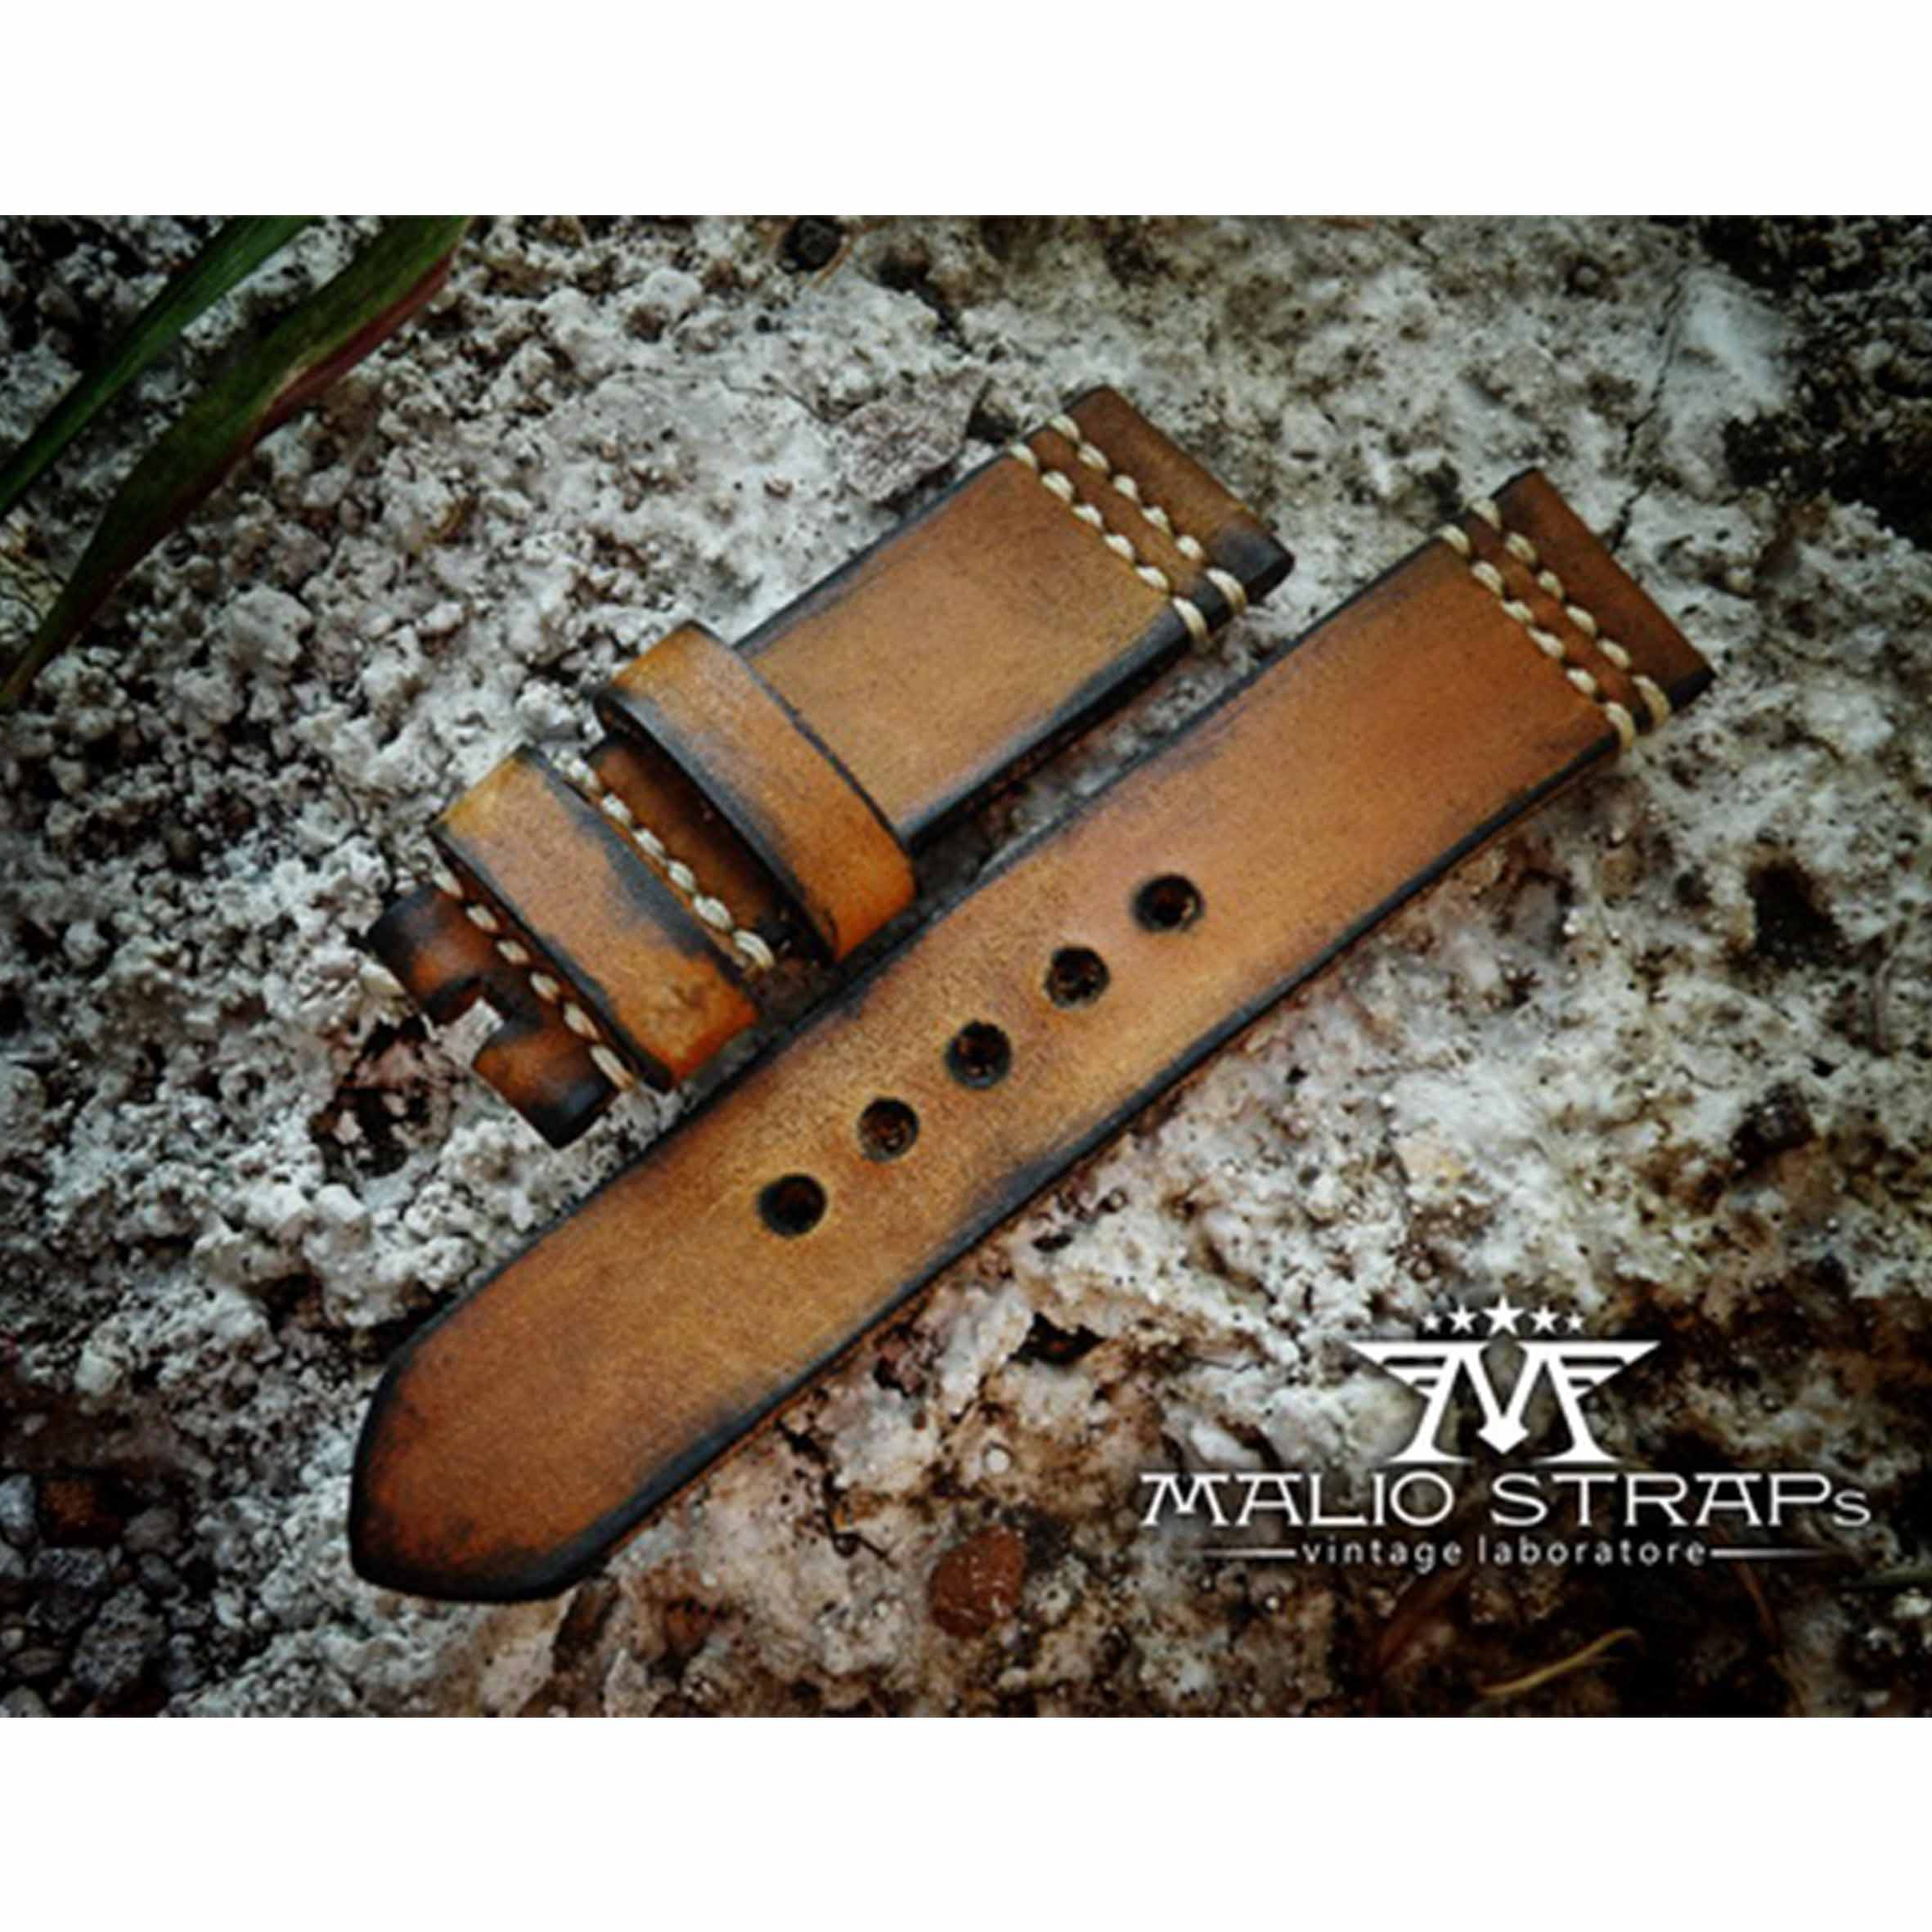 malio-straps-bombardierre-strapsonly (1)